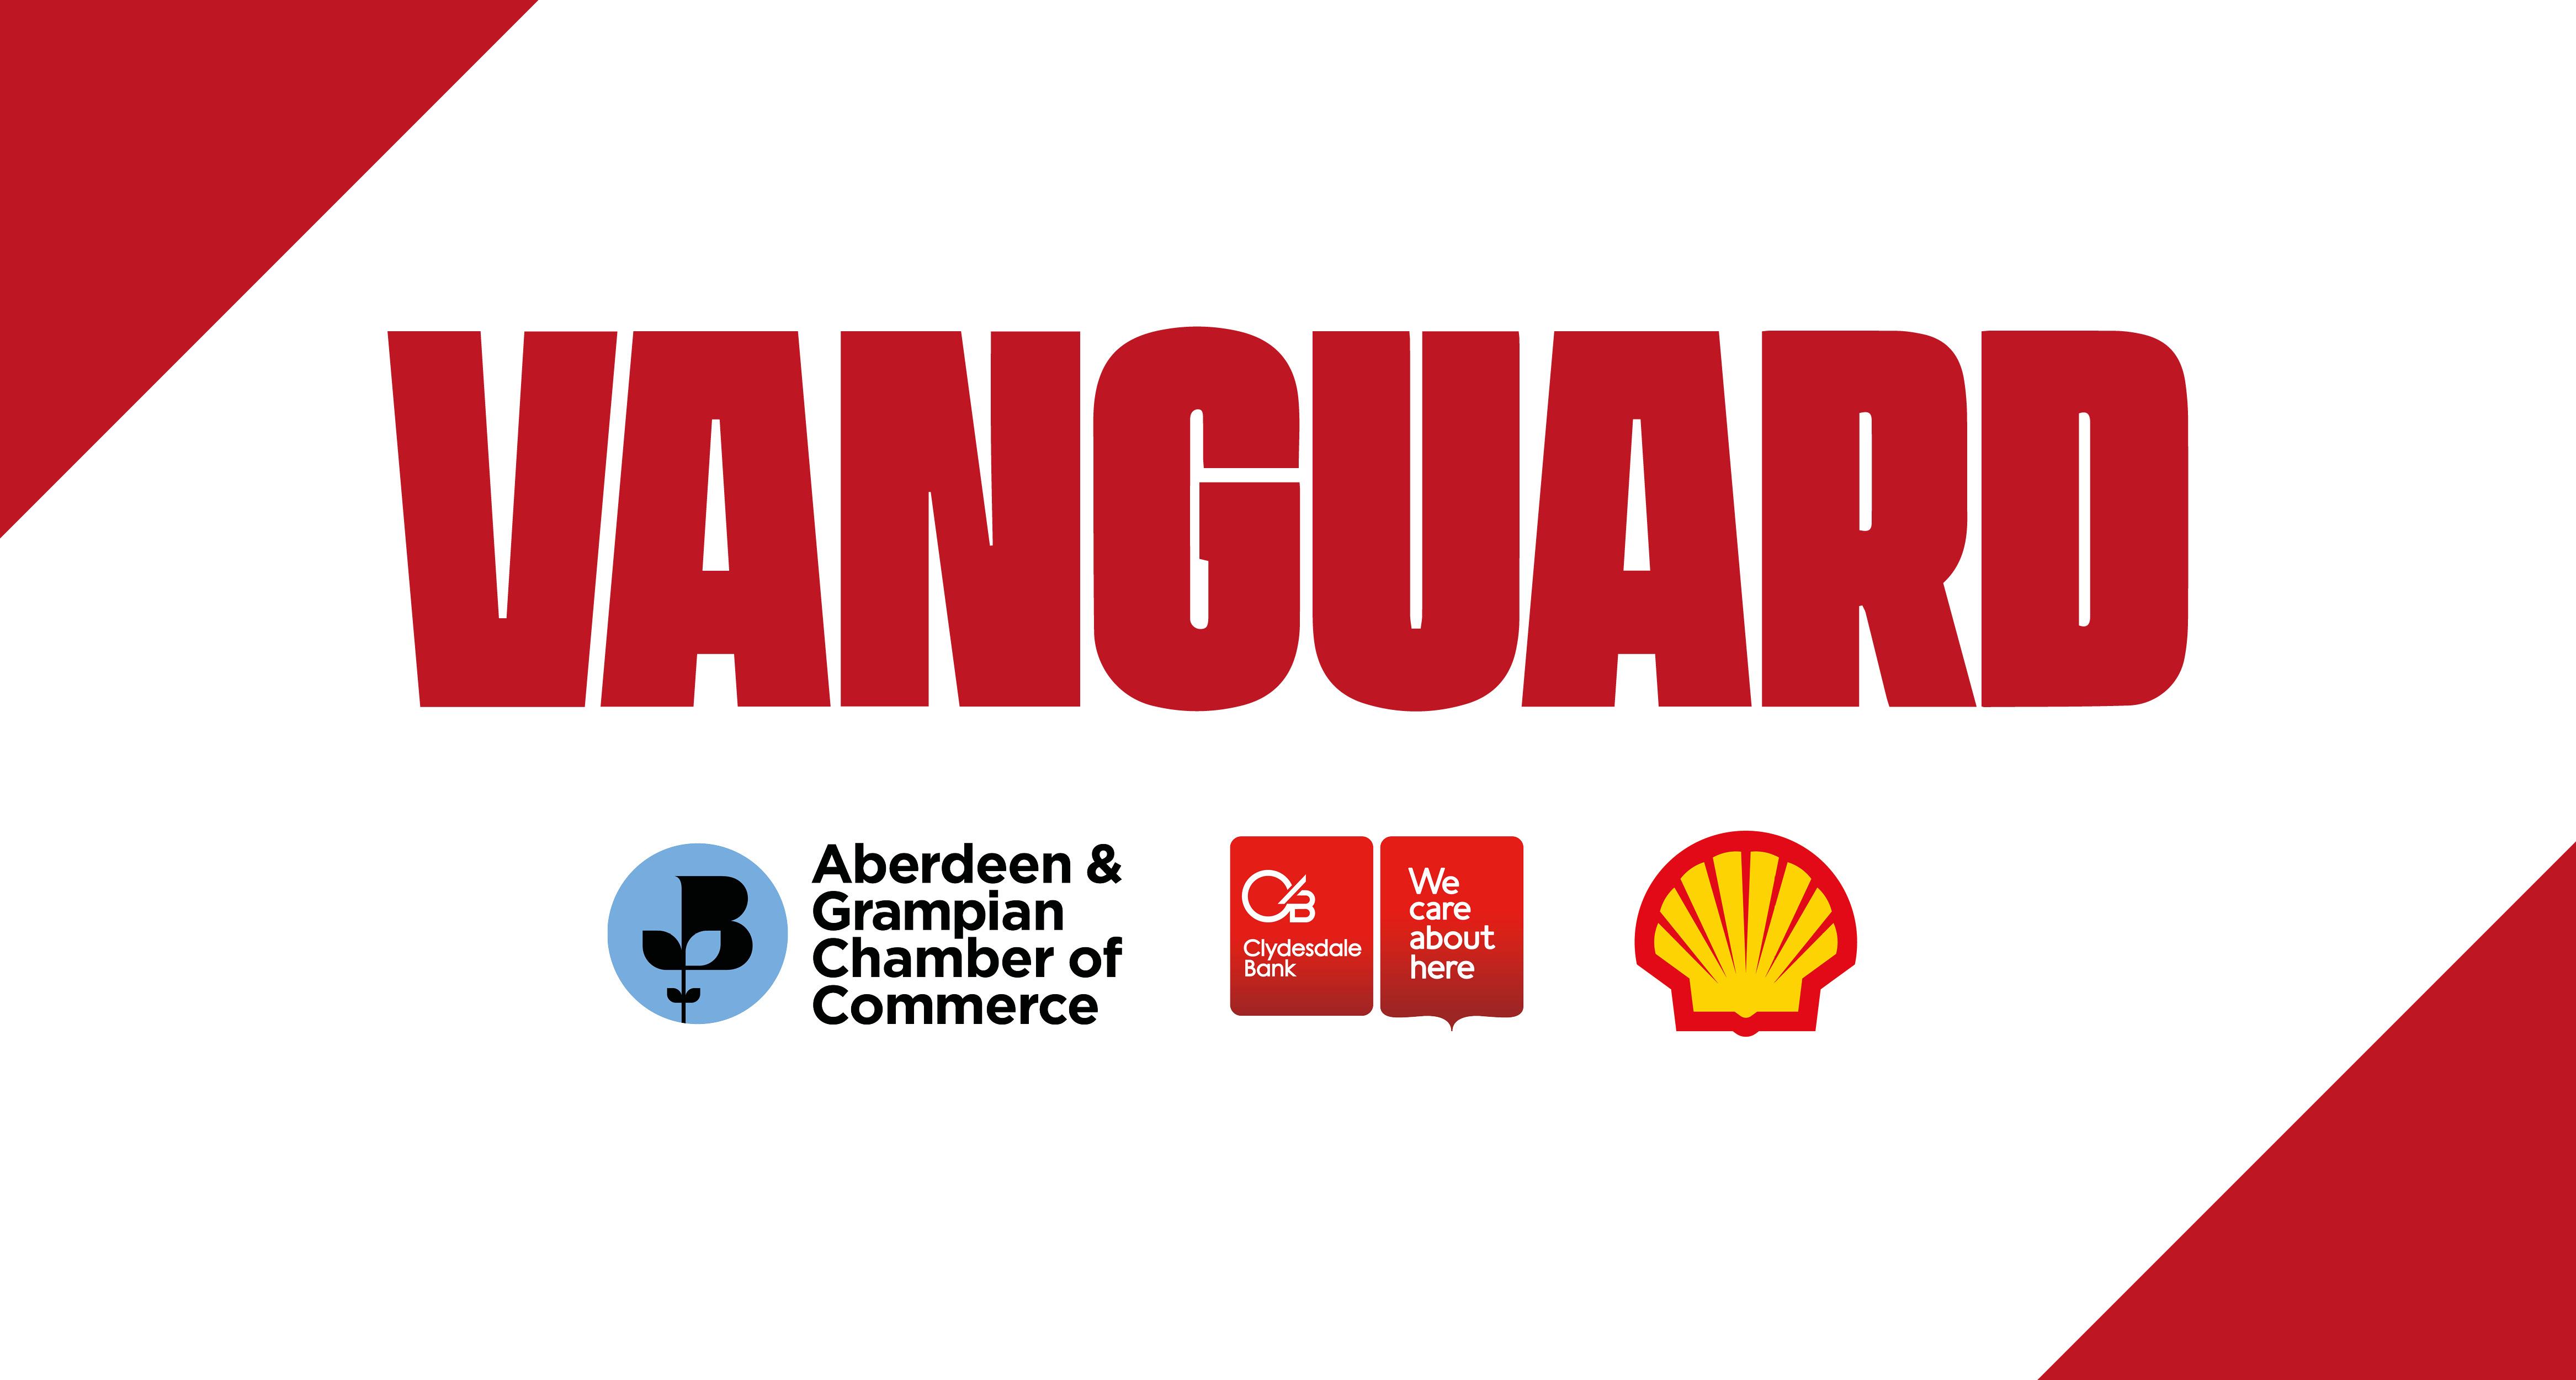 Vanguard - Summer Event